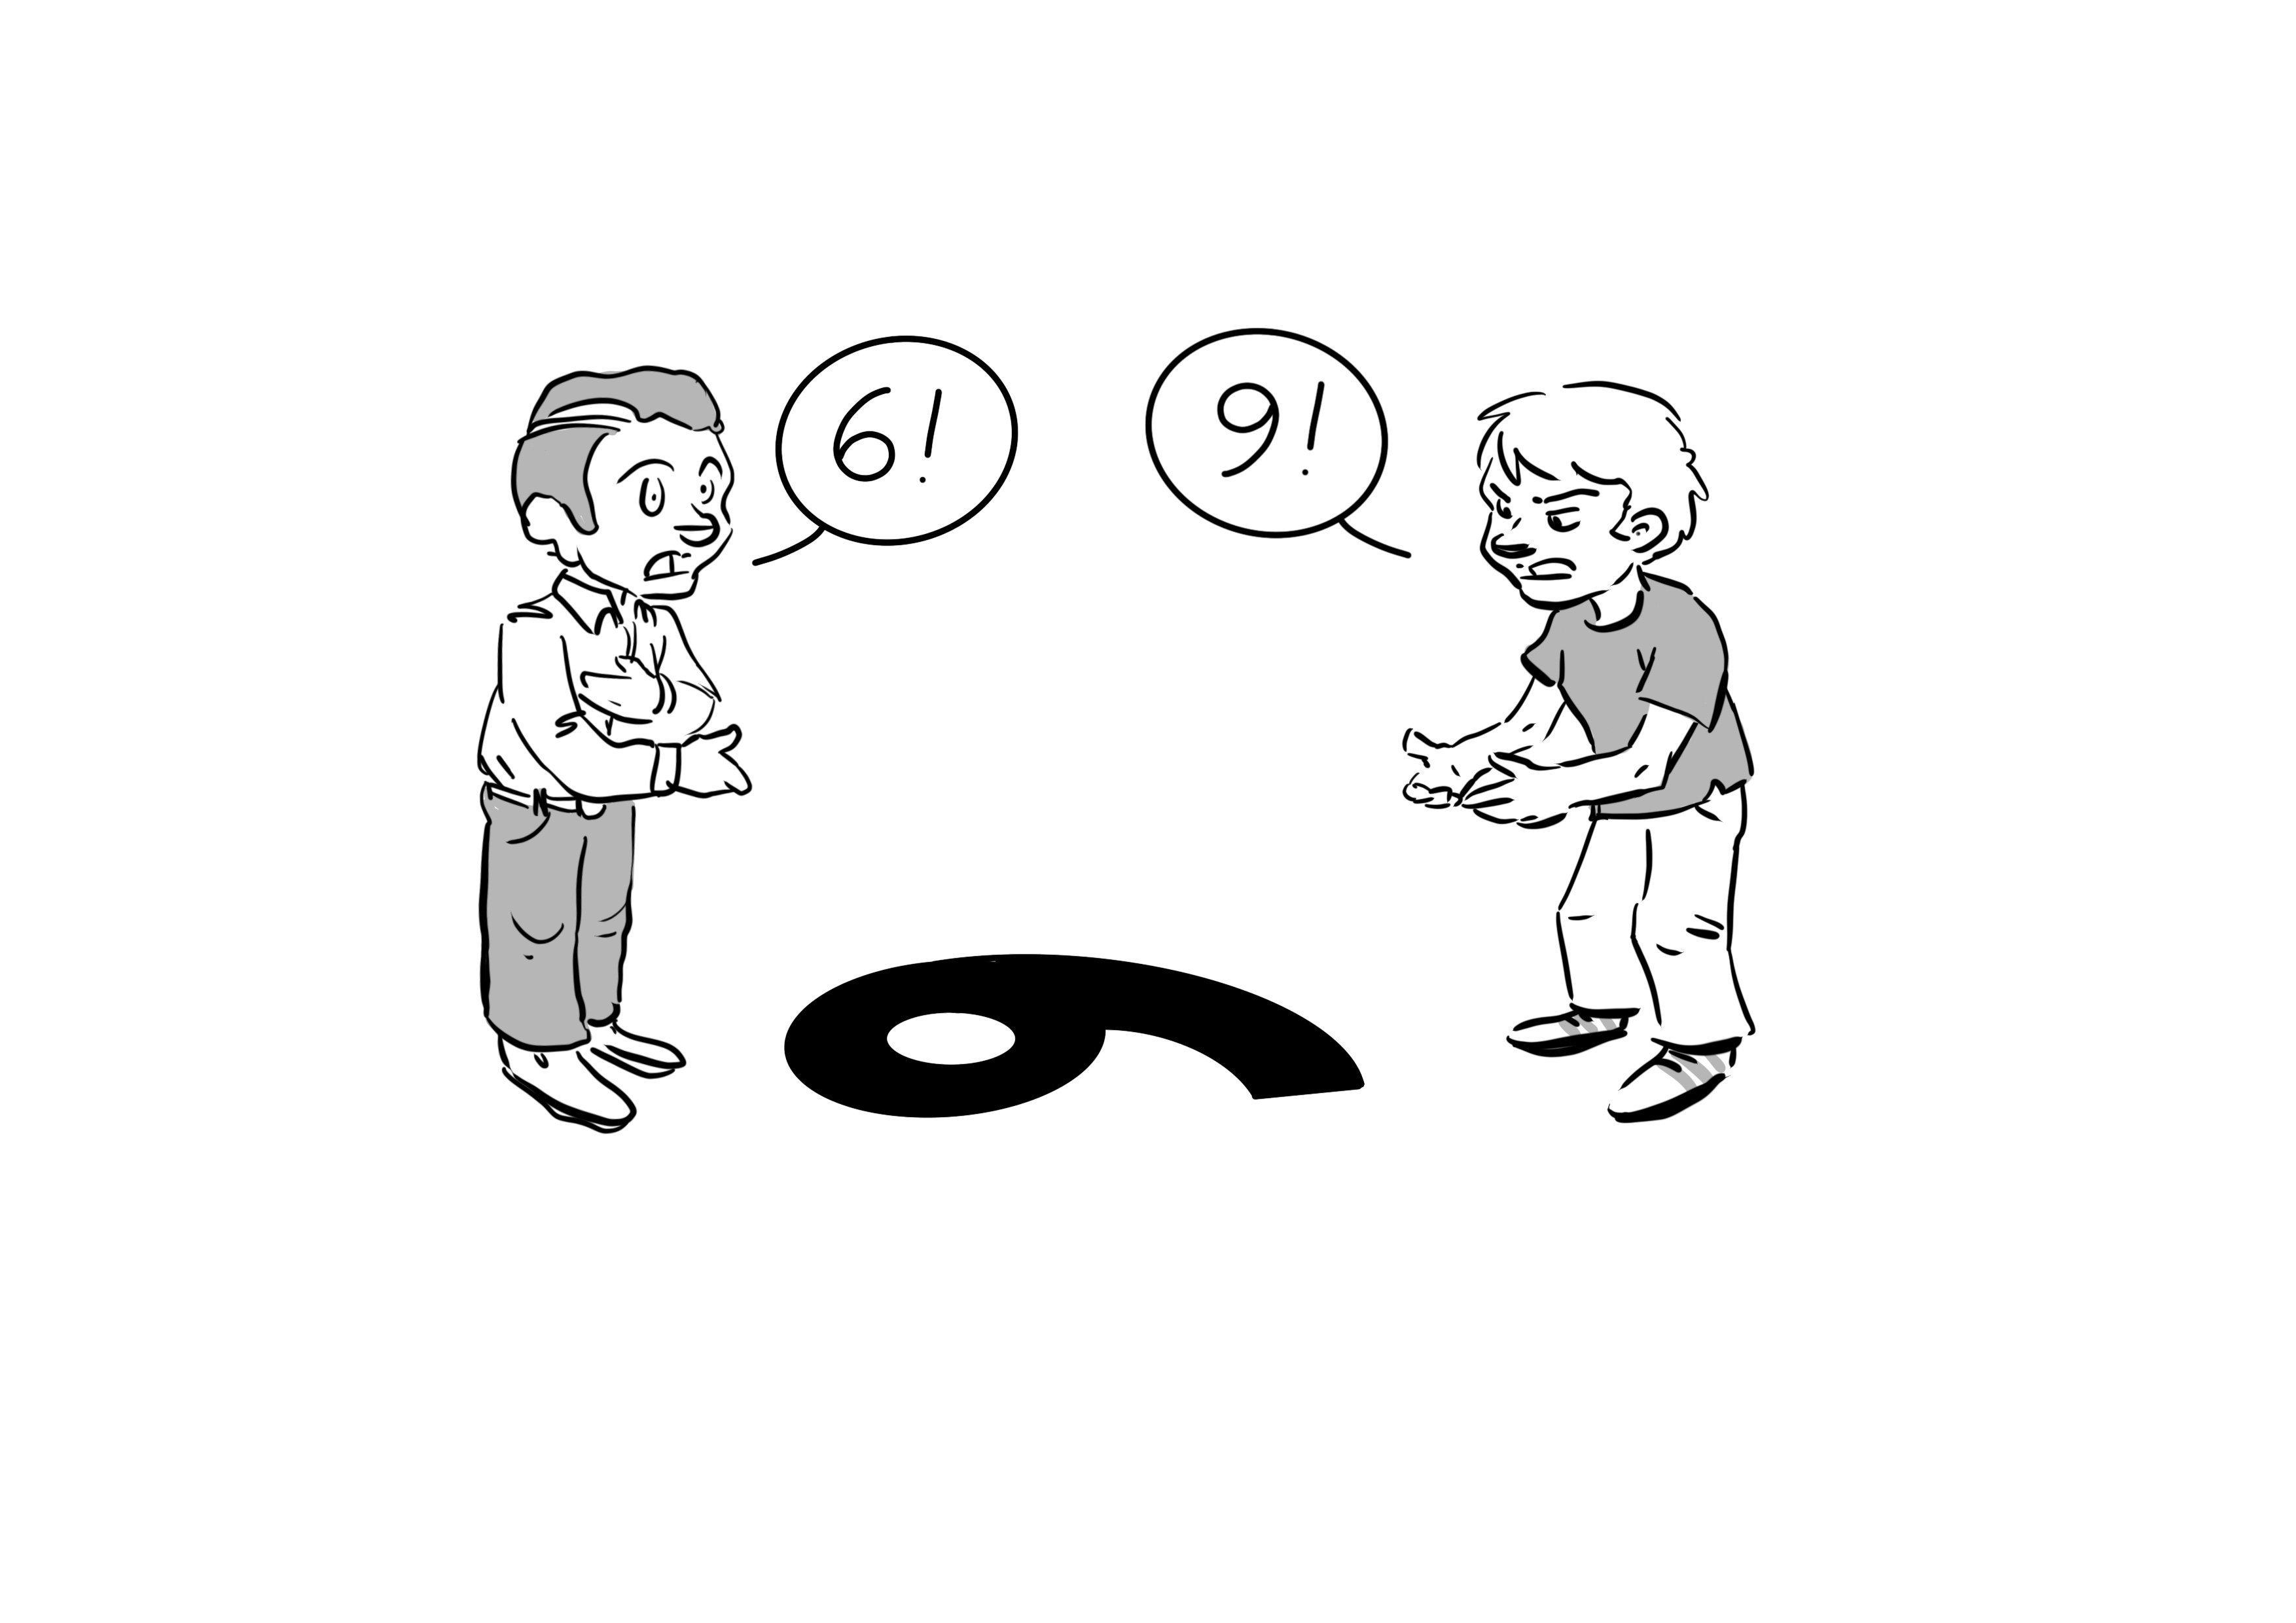 6 e 9